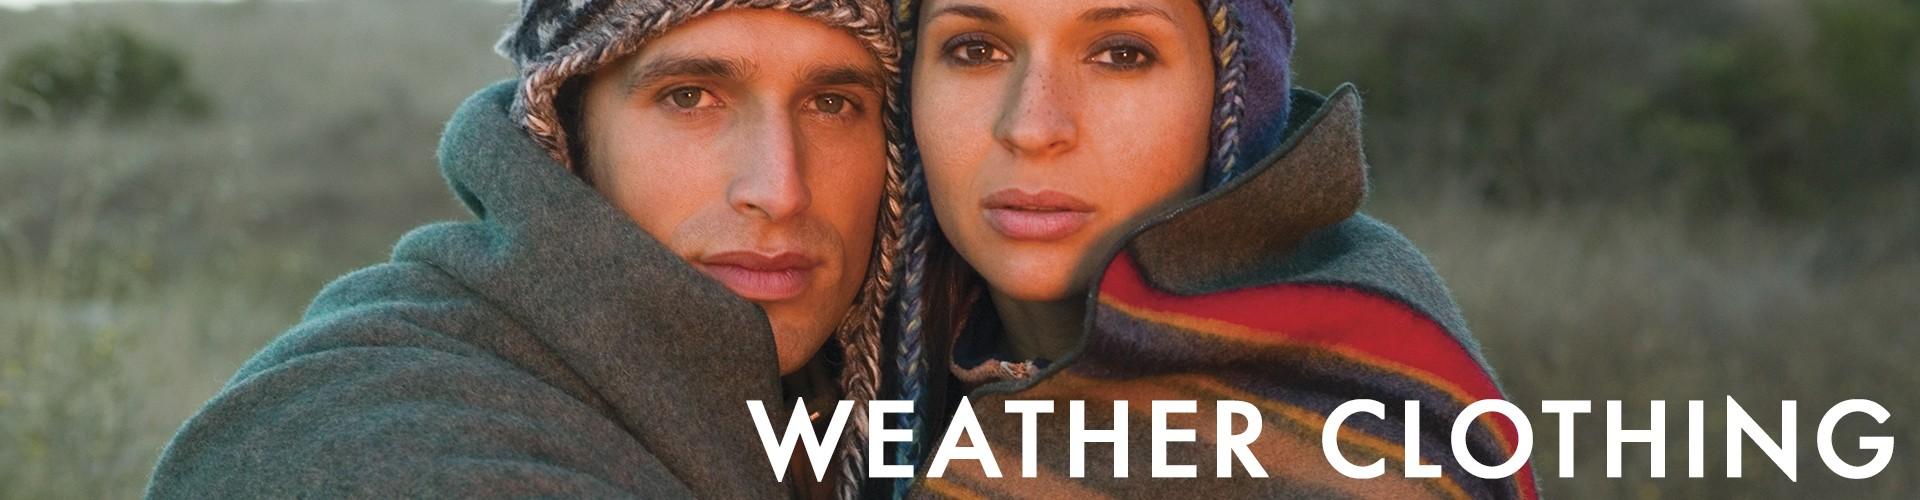 weather-clothing